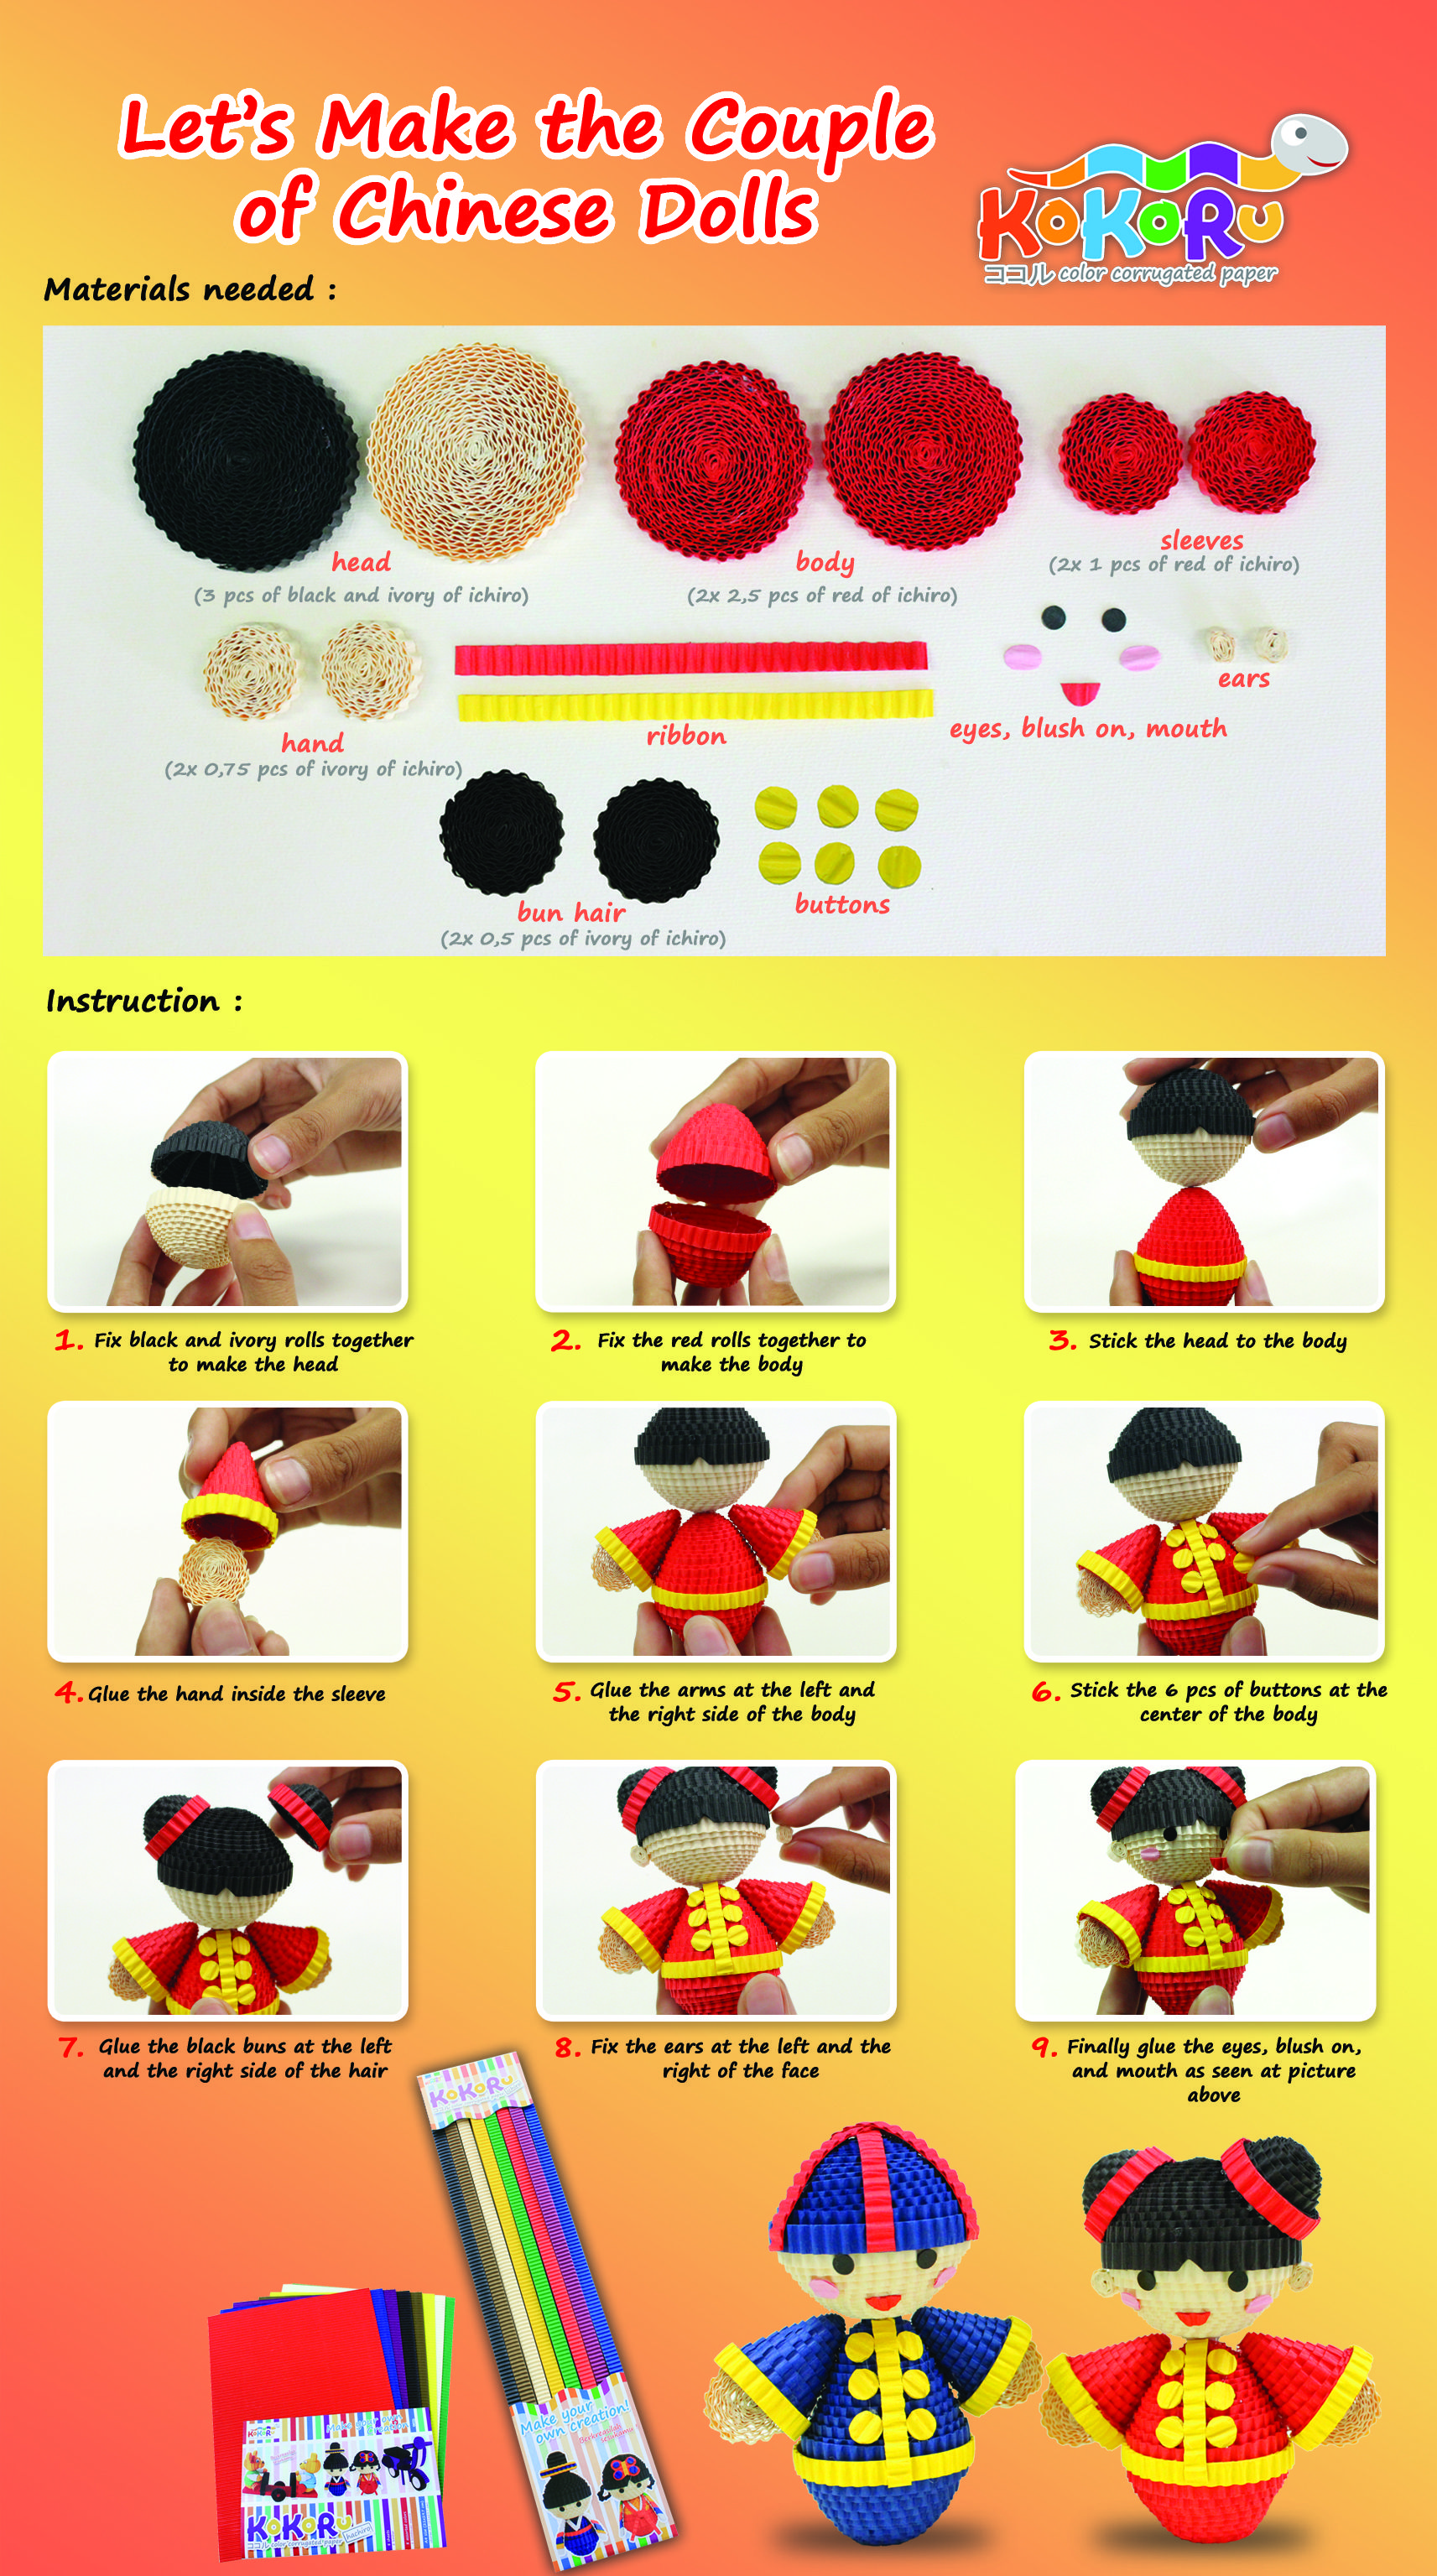 How To Make Chinese Doll Kokoru Seni Kerajinan Kertas Orang Cina